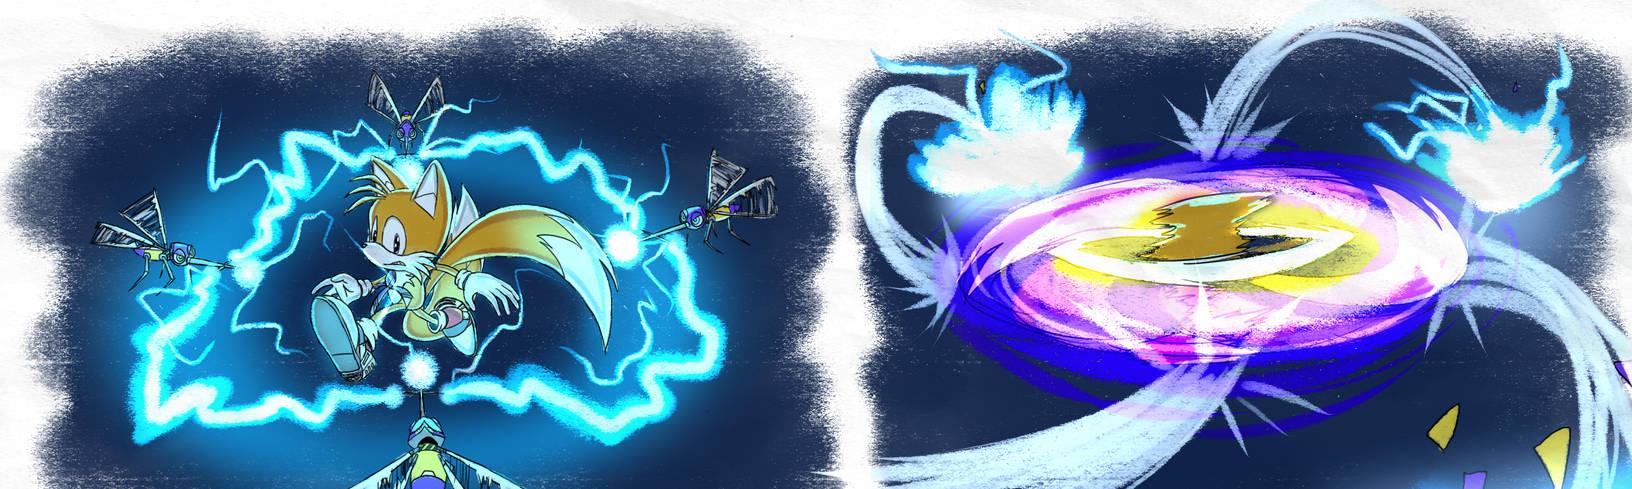 Egg Walker Shockers - SA1 Remake Fan Concept Art